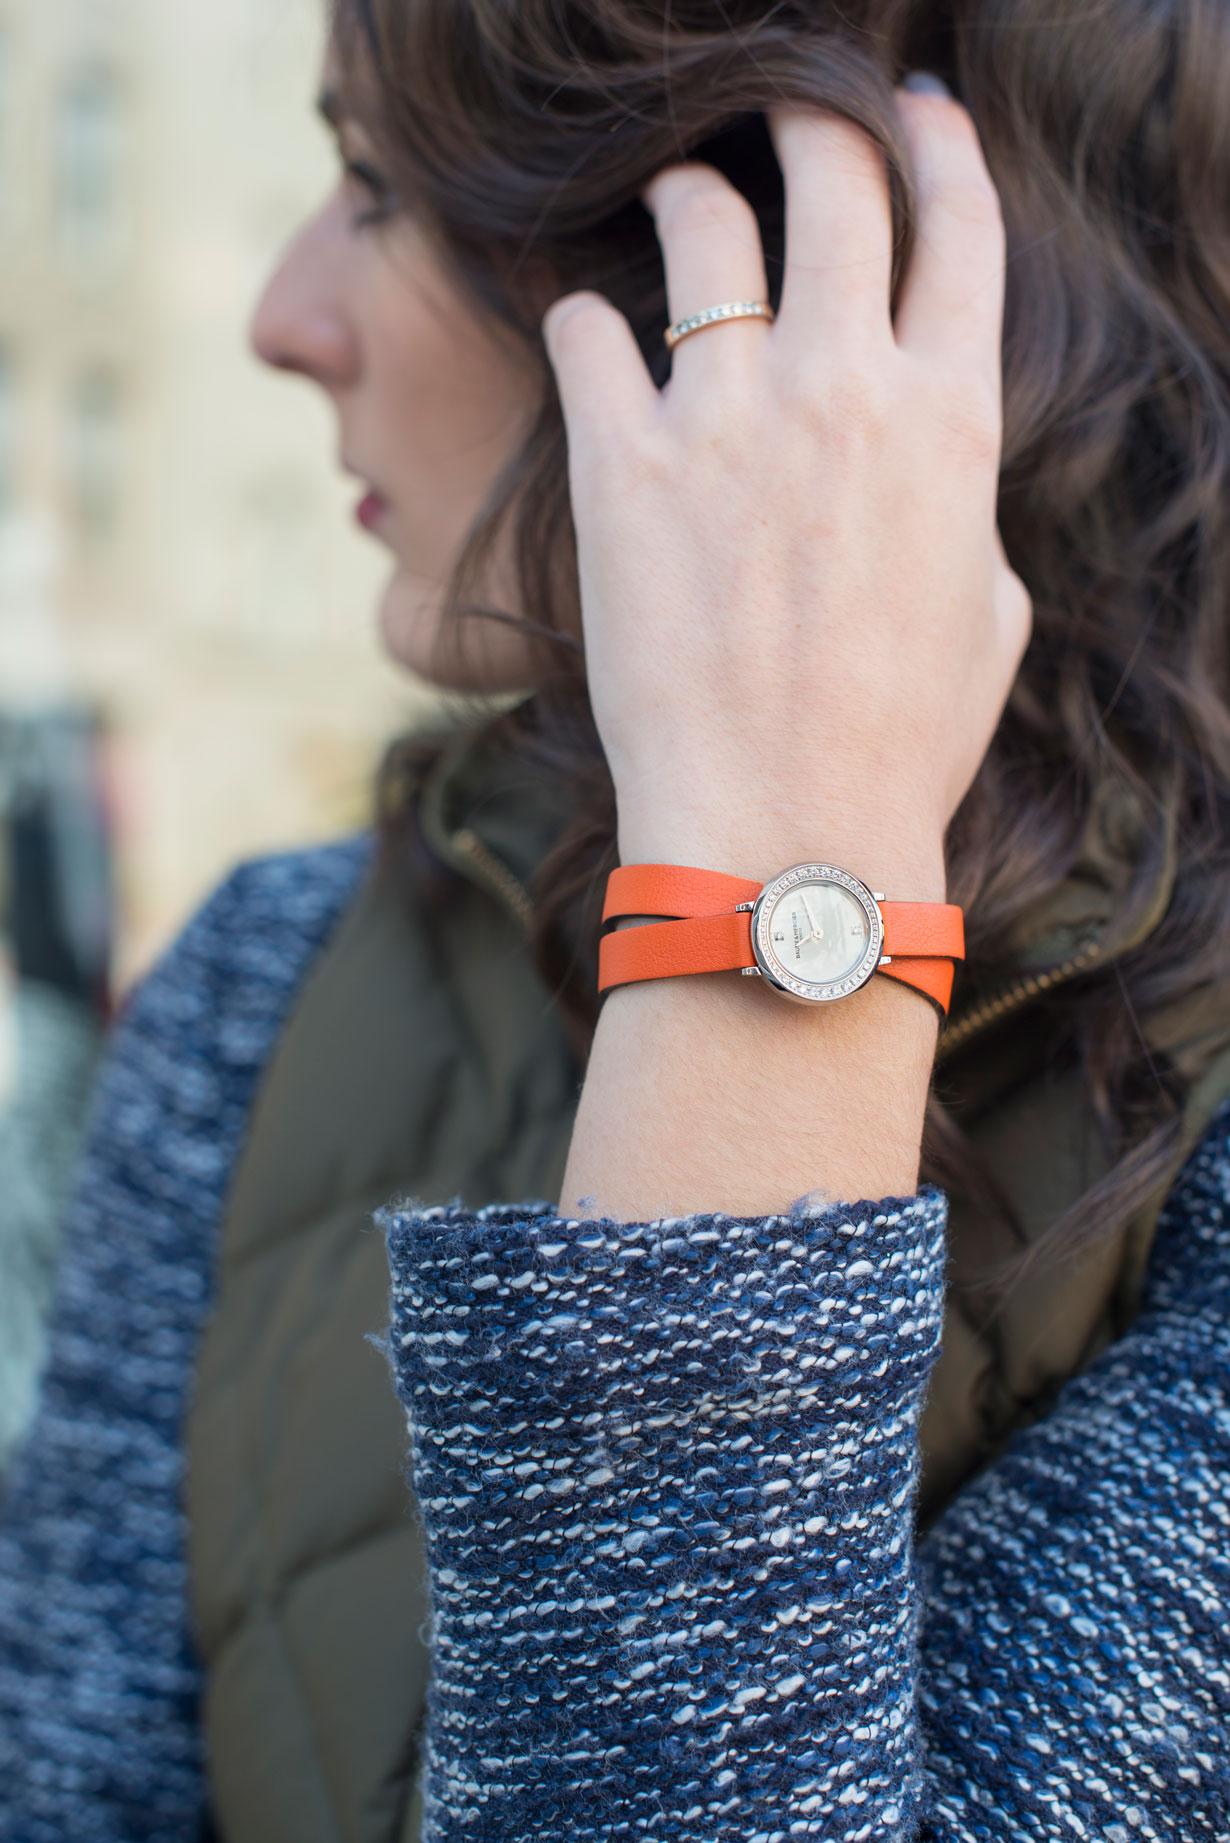 baume-et-mercier-petite-promeese-orange-watch